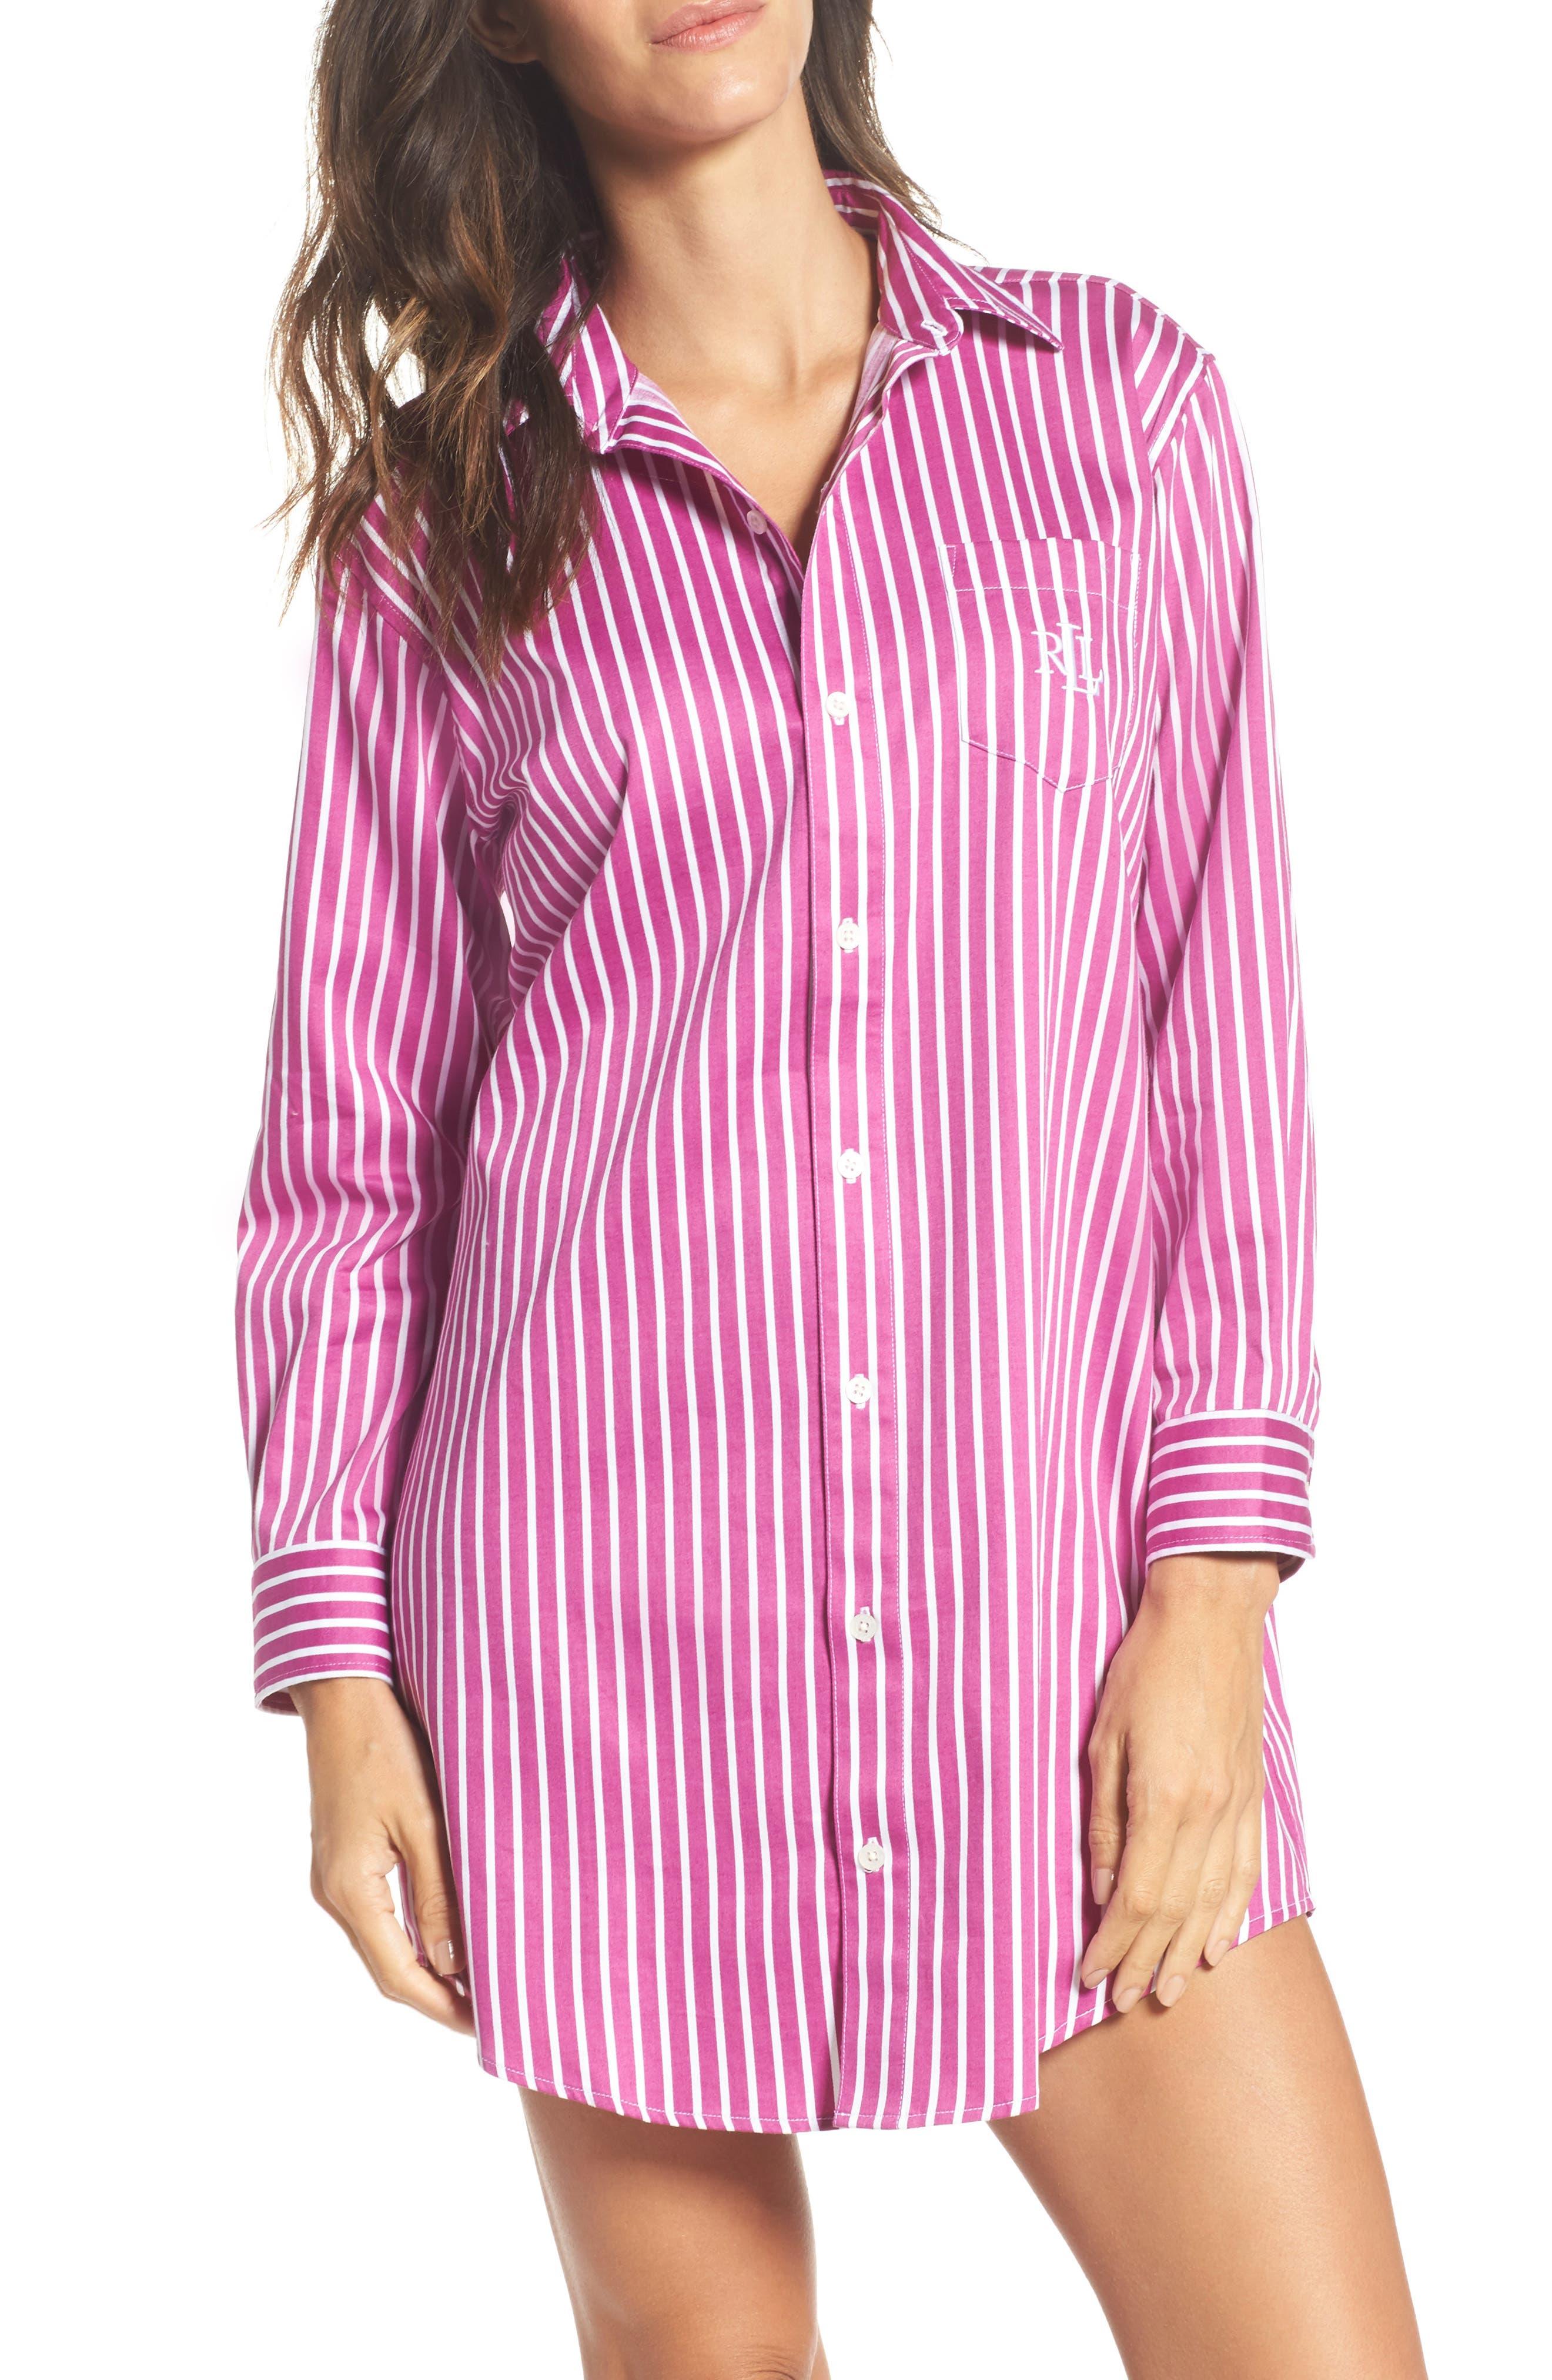 Sleep Shirt,                             Main thumbnail 1, color,                             Pink/ White Stripe